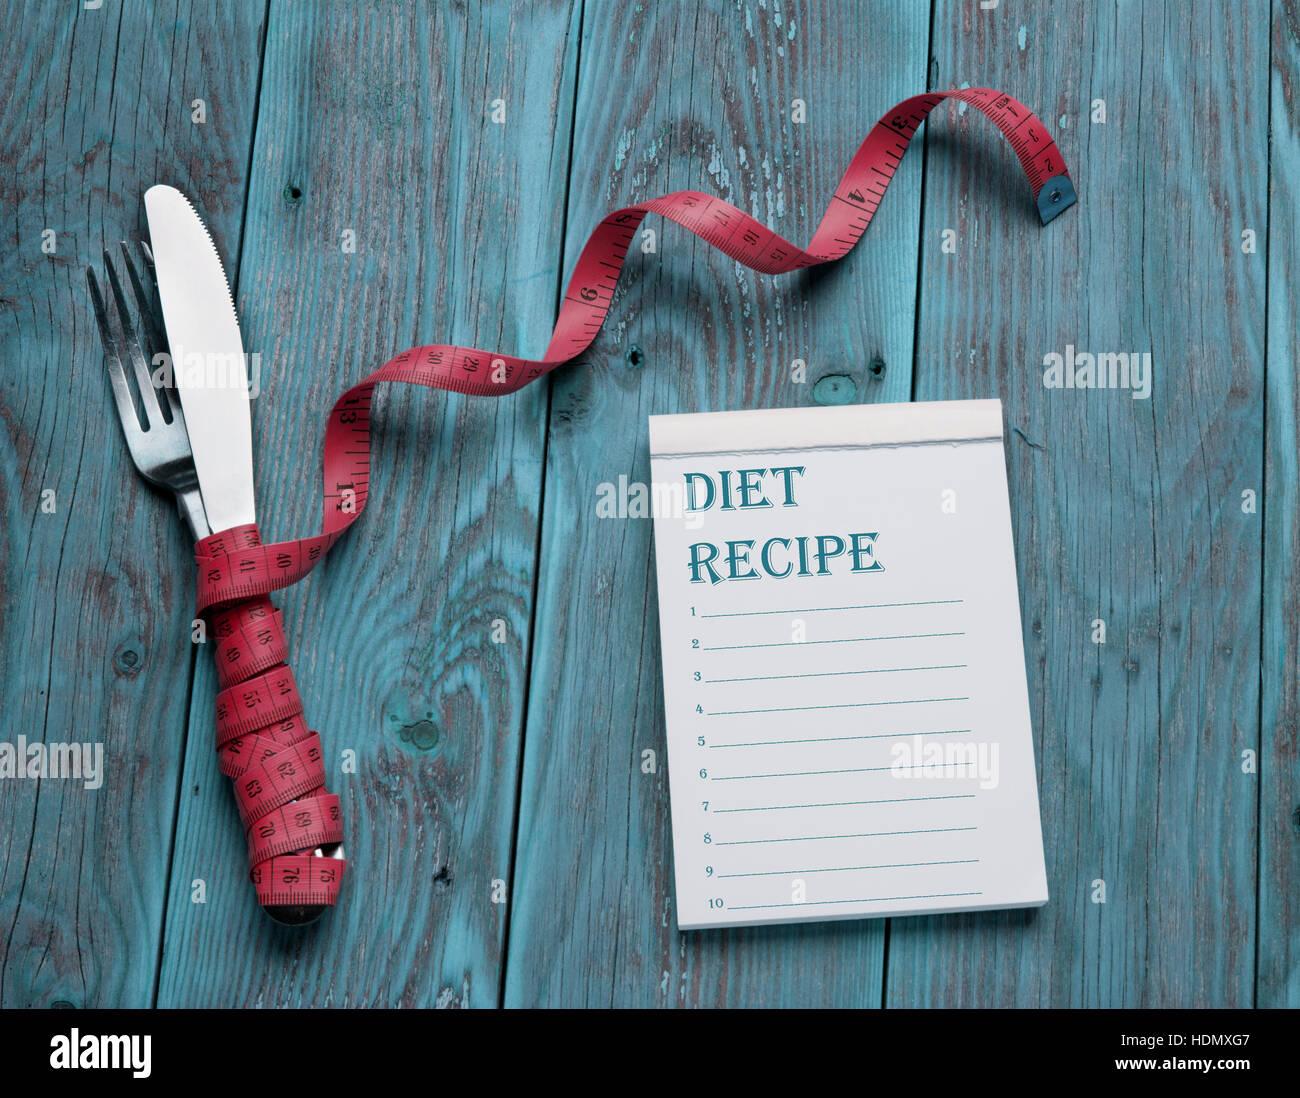 Plan de dieta, menú o programa, cinta métrica, sobre fondo azul de alimentos de dieta, pérdida de Imagen De Stock